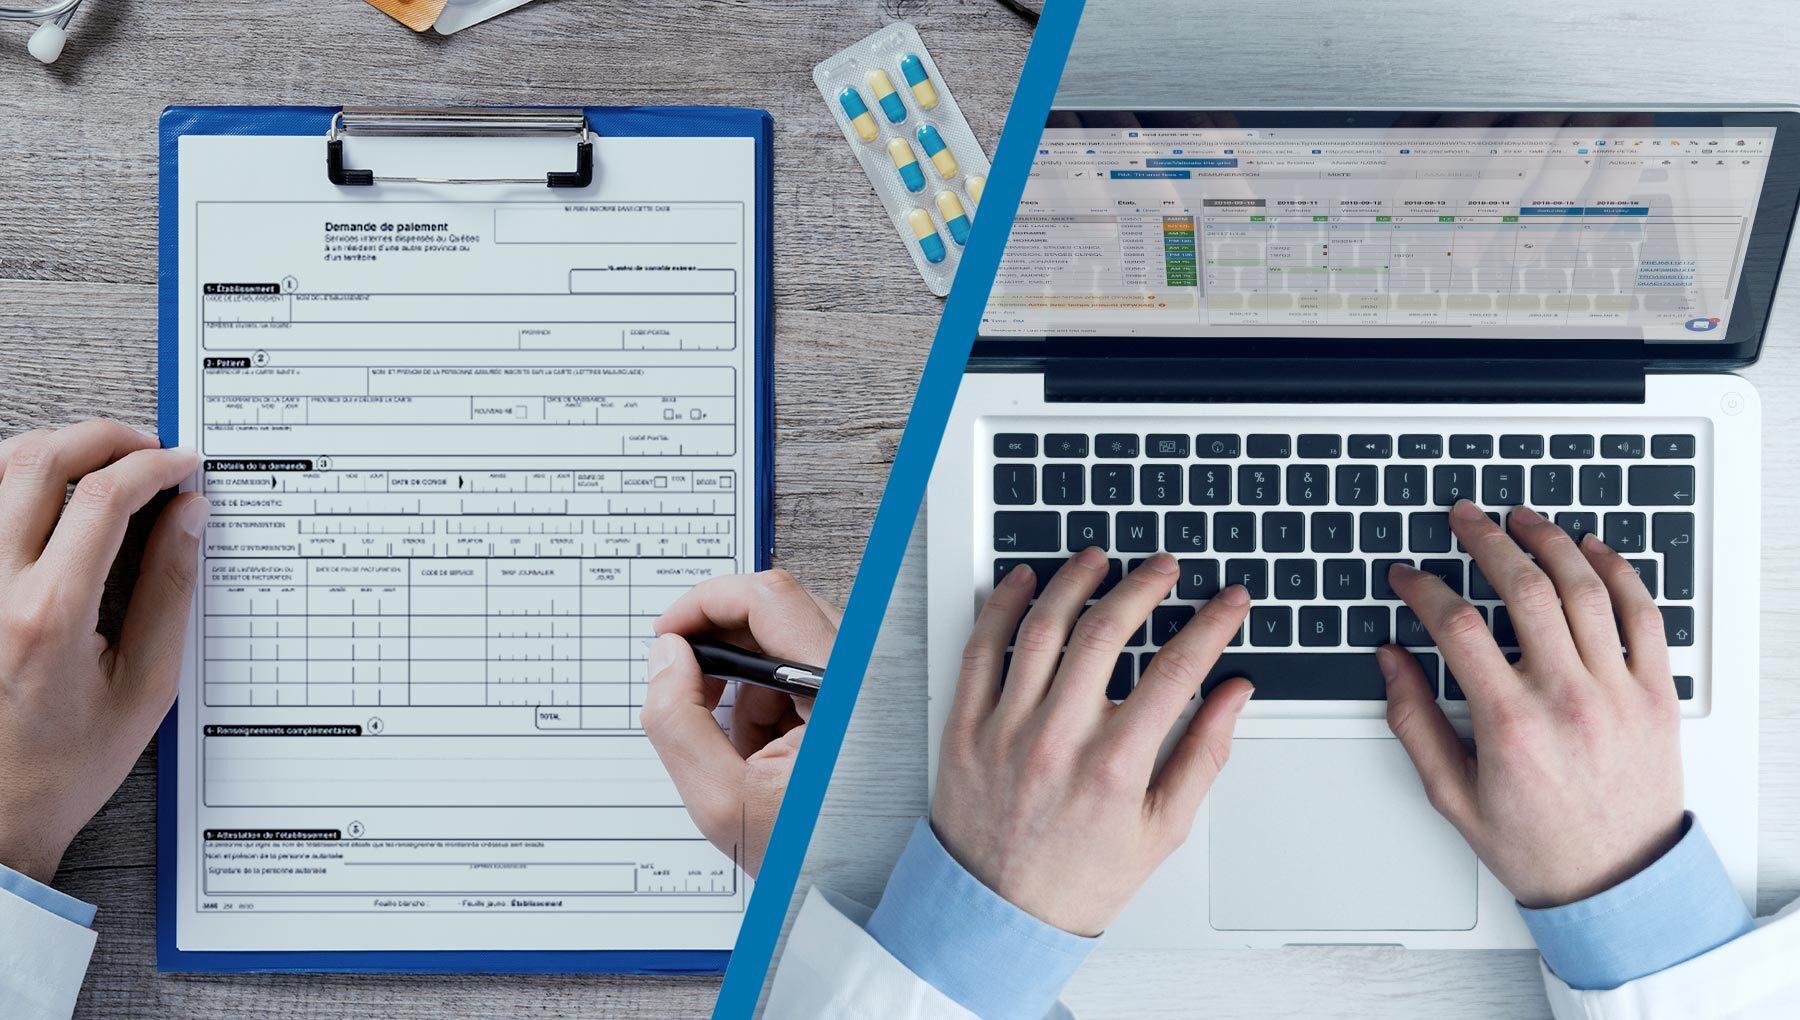 3 Major Differences Between Digital vs. Paper RAMQ Billing